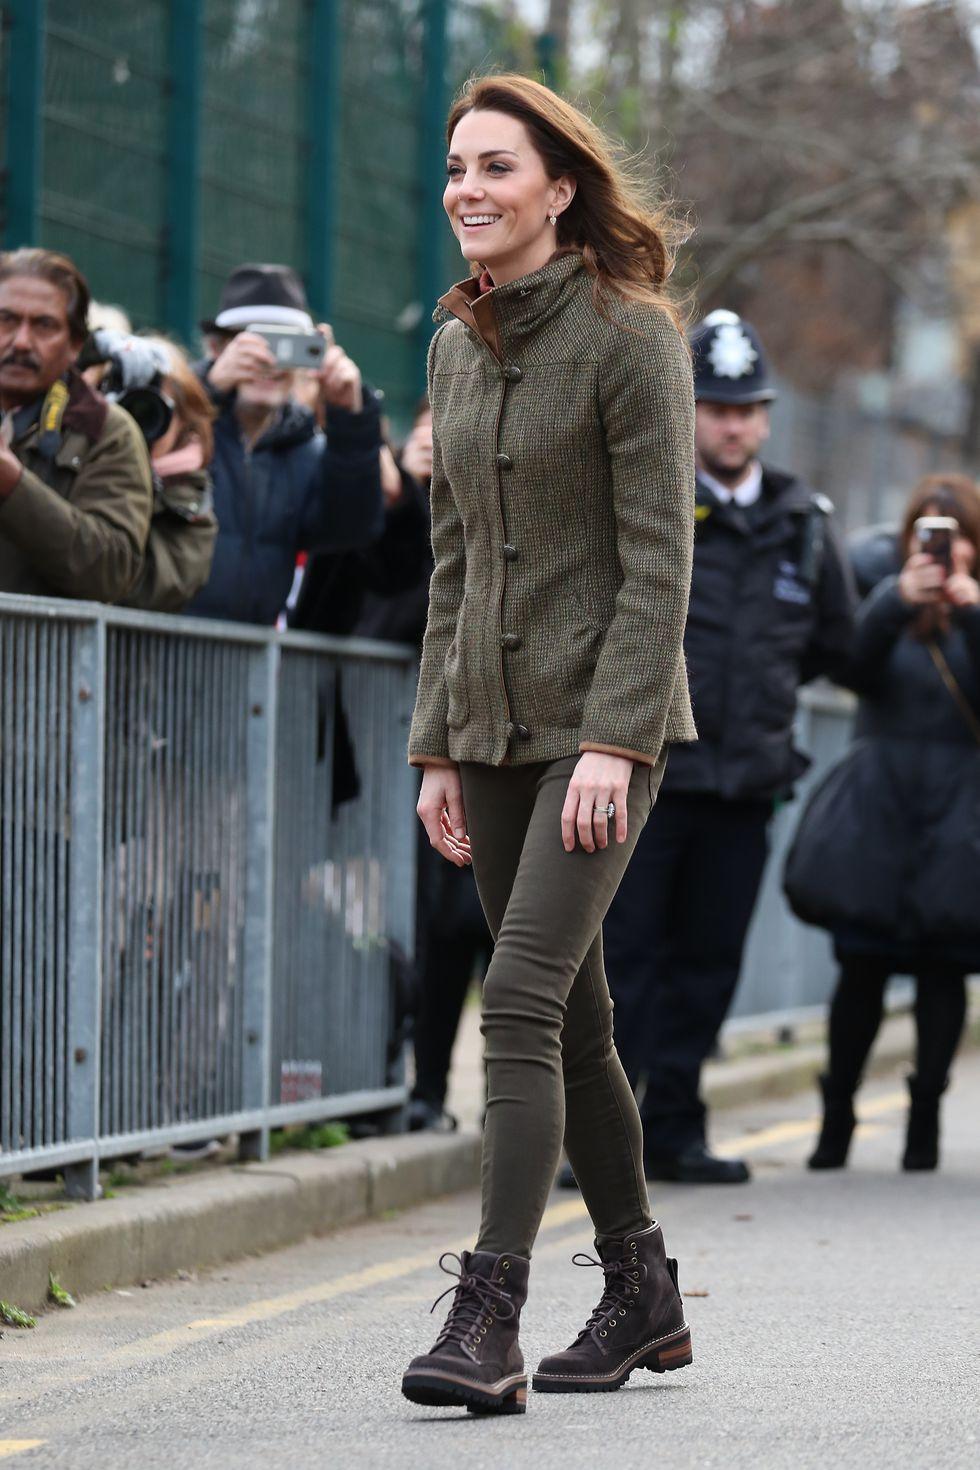 f086b64c FA103FC5-3755-40D4-8C8E-BCEB63BDA1D8 Kate Middleton Latest, Kate Middleton  Outfits